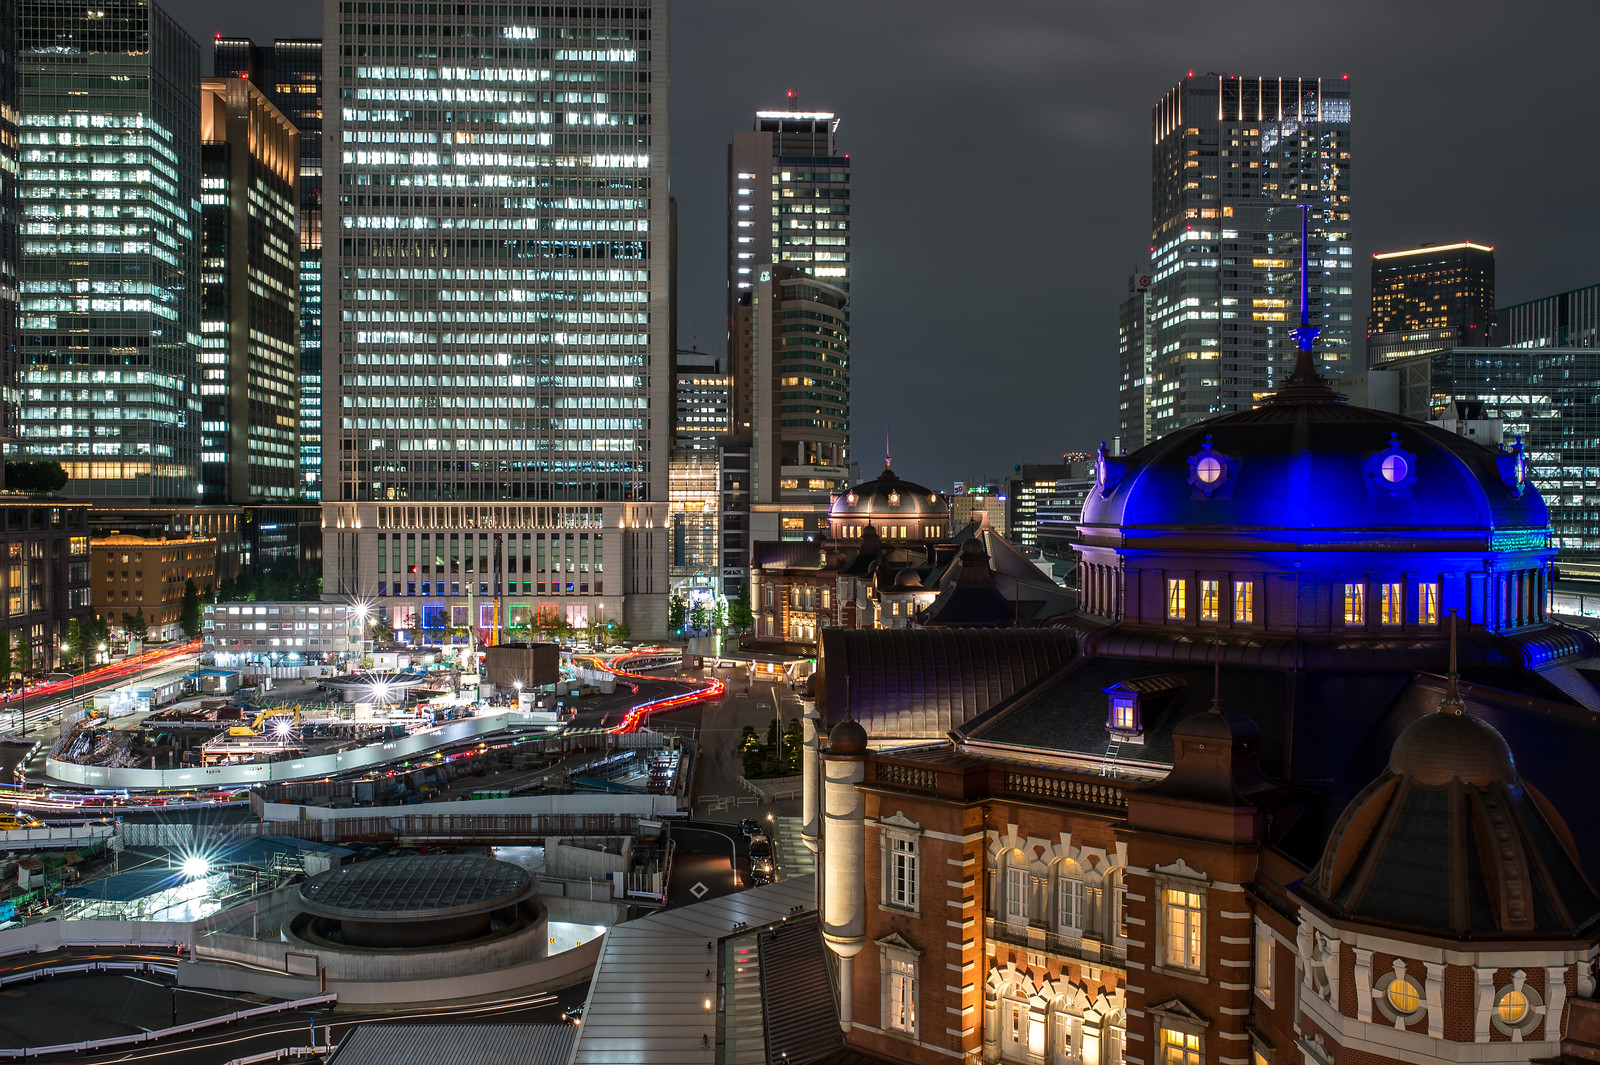 Tokyo Station 20:38